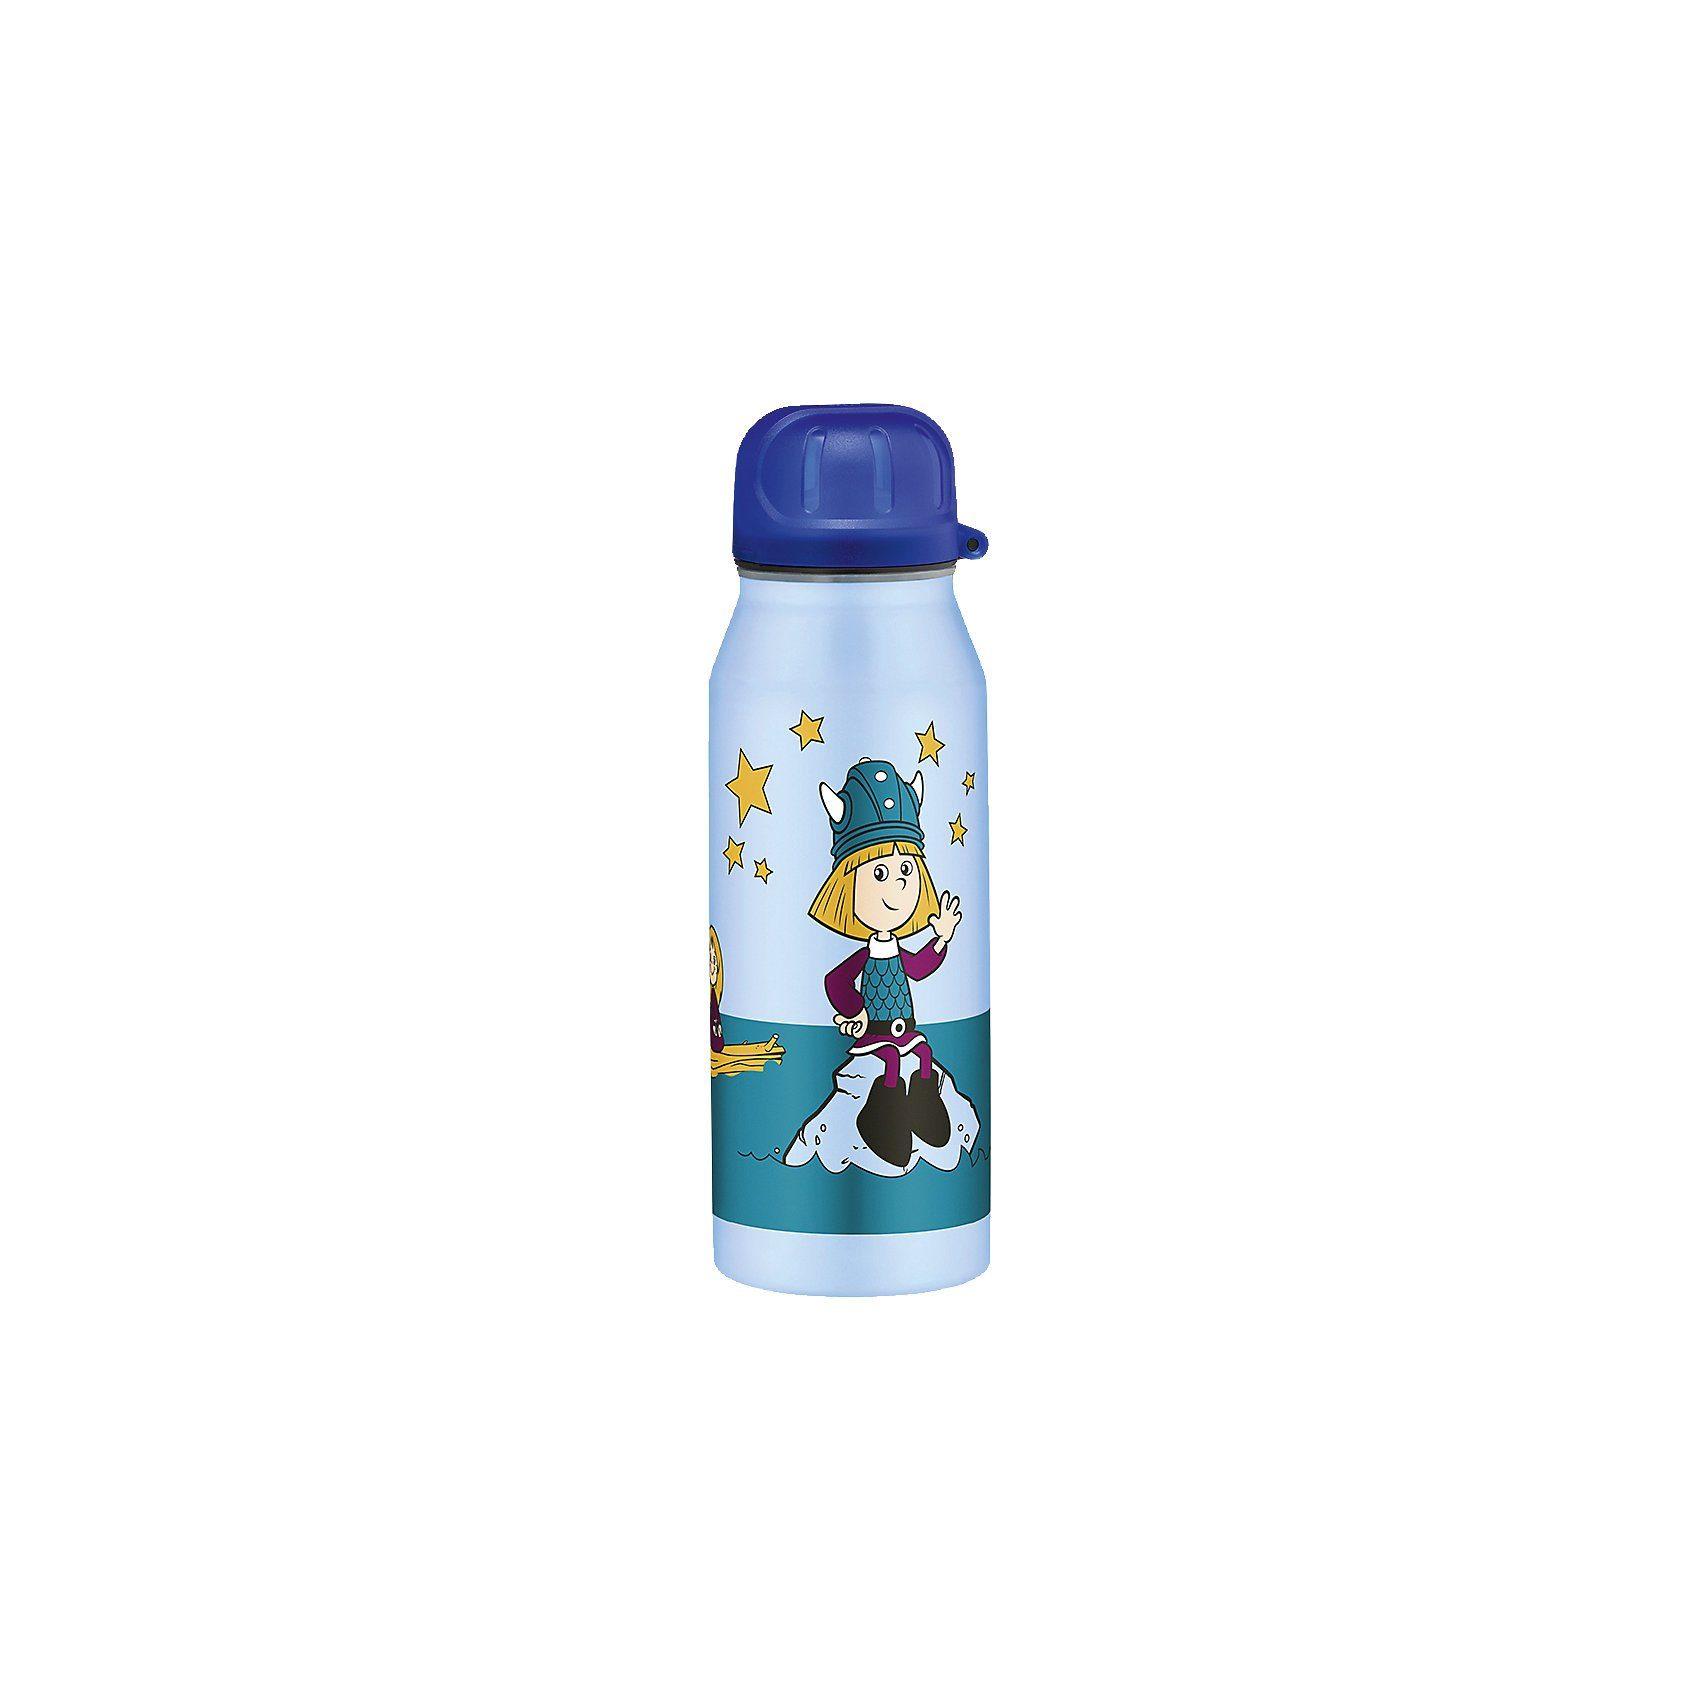 Alfi Isolier-Trinkflasche Wickie blau, 0,35 l